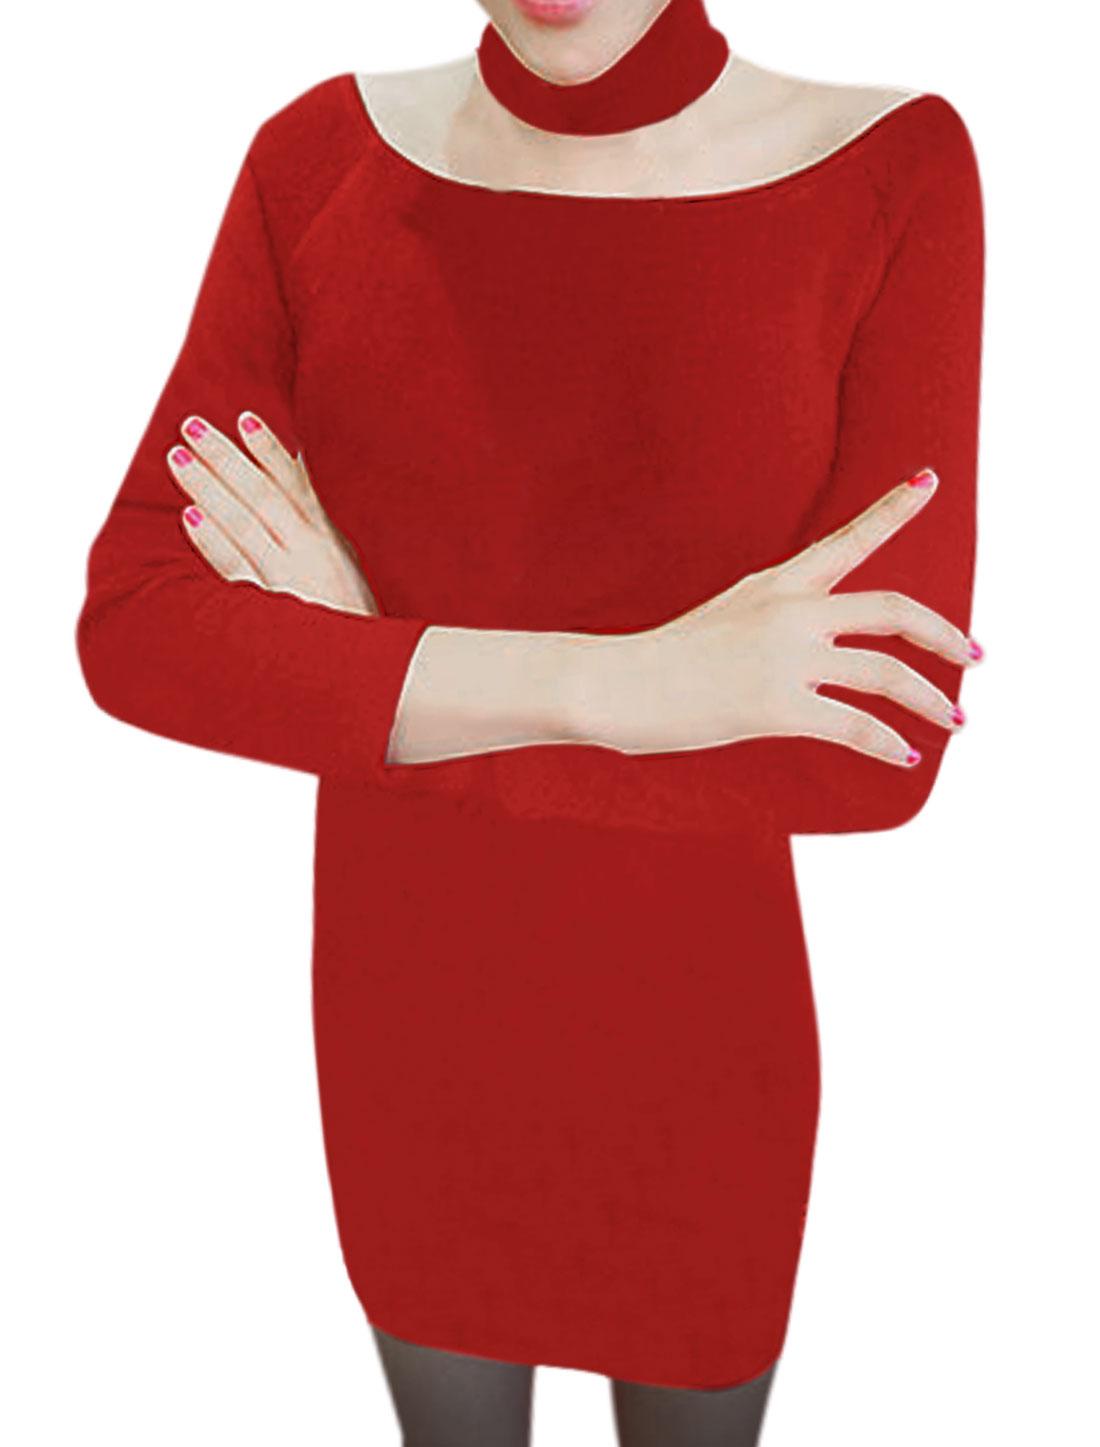 Women Long Sleeve Boat Neck Pullover Leisure Sheath Dress Warm Red M